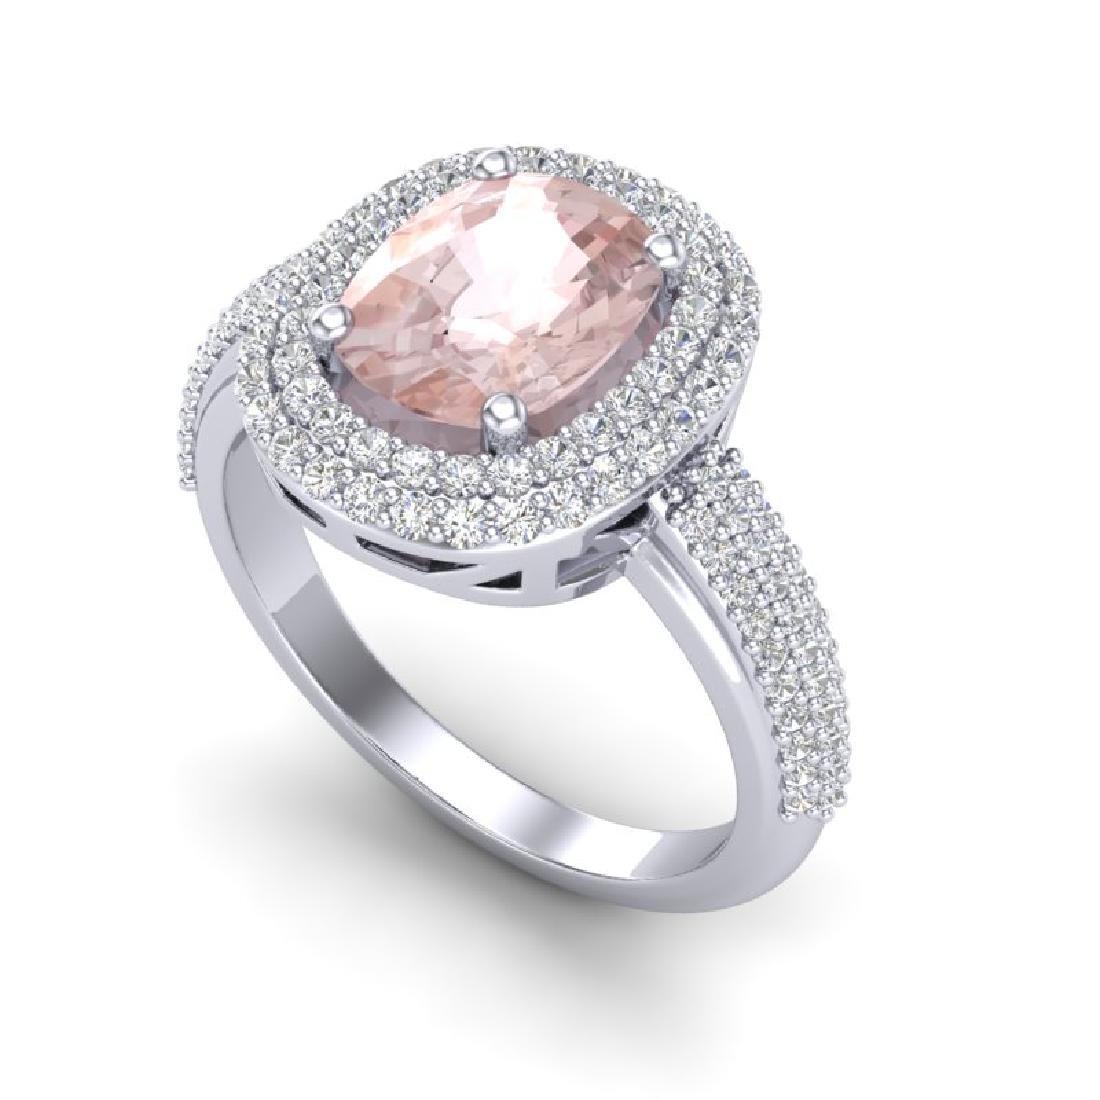 3.25 CTW Morganite & Micro Pave VS/SI Diamond Halo Ring - 2